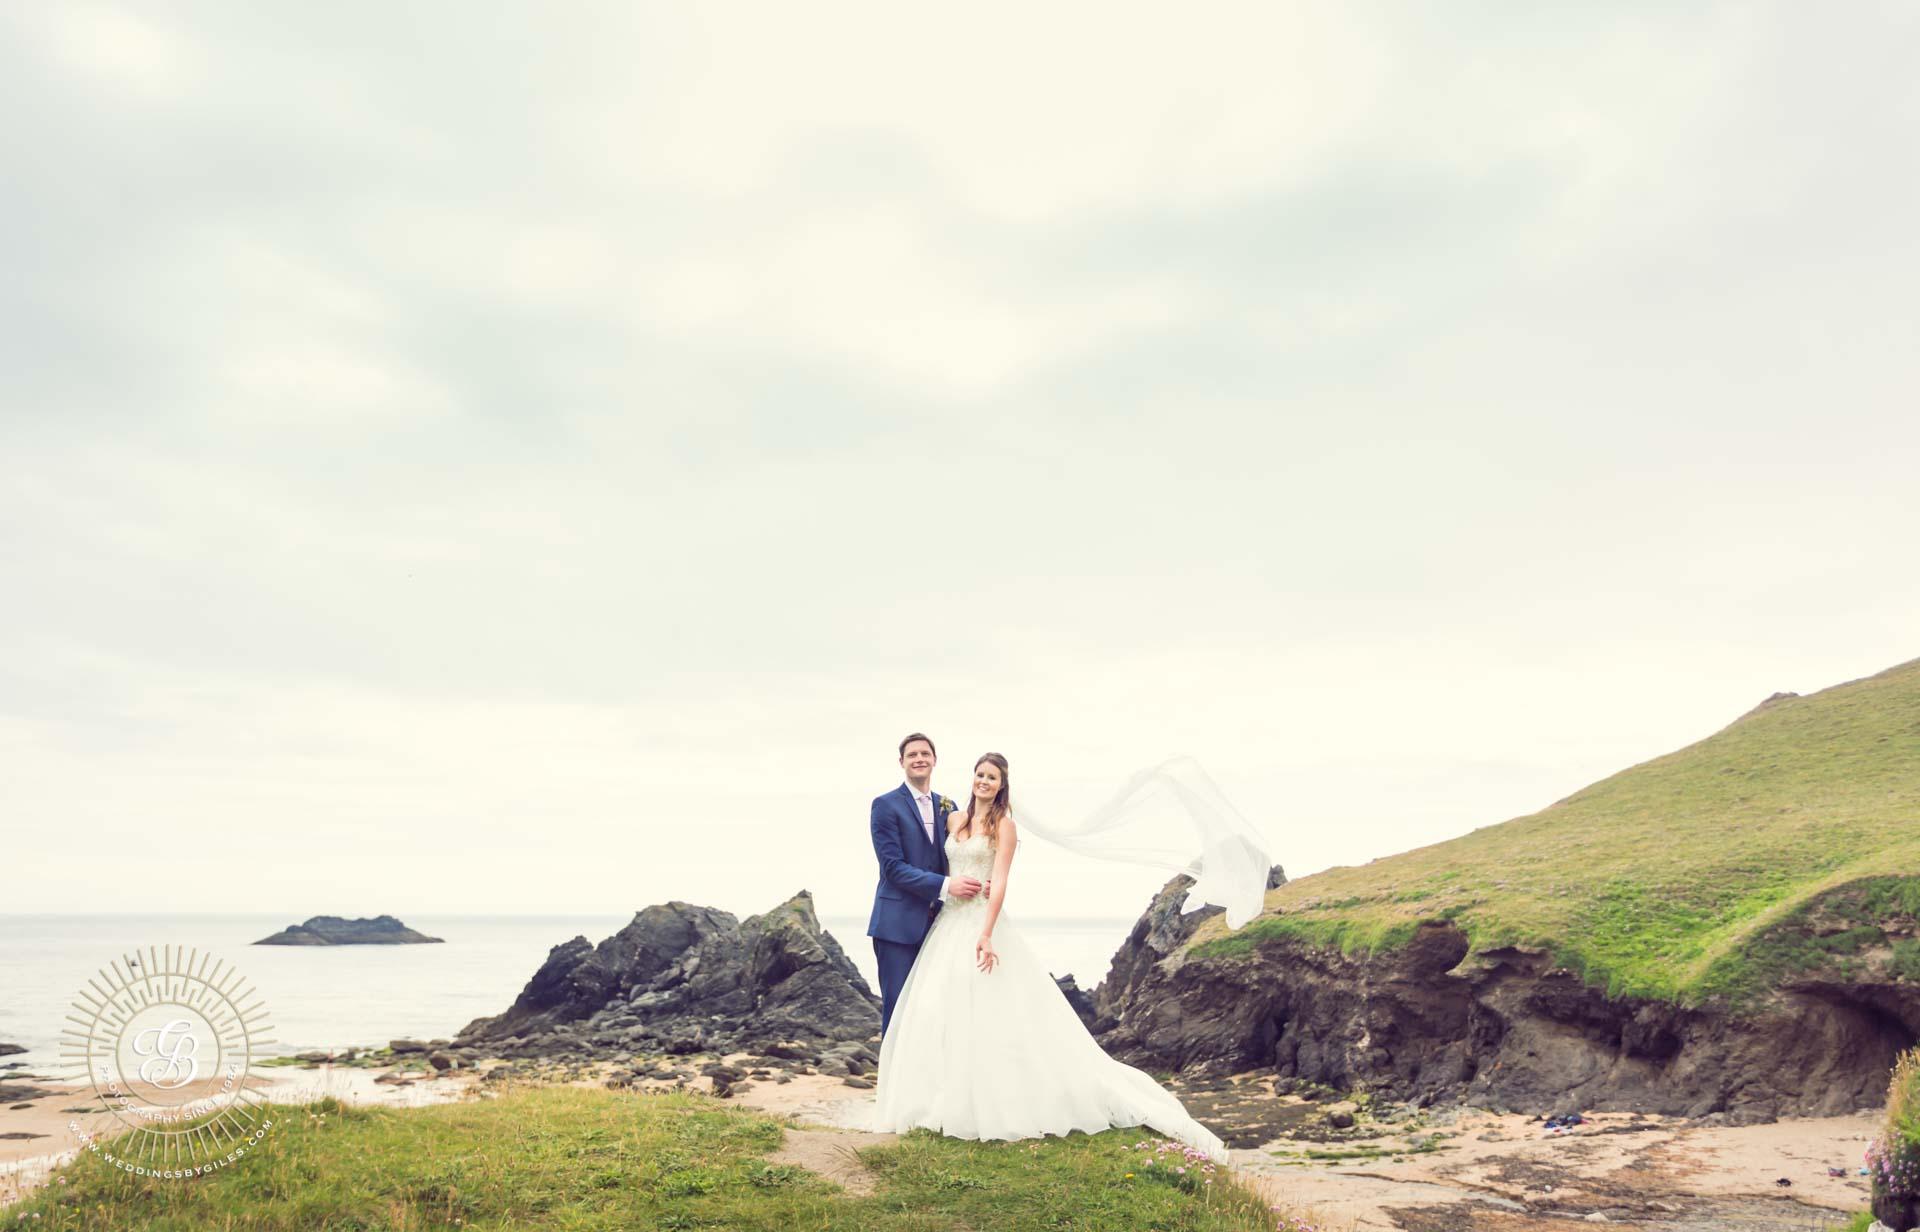 Soar Mill Cove wedding beach portrait